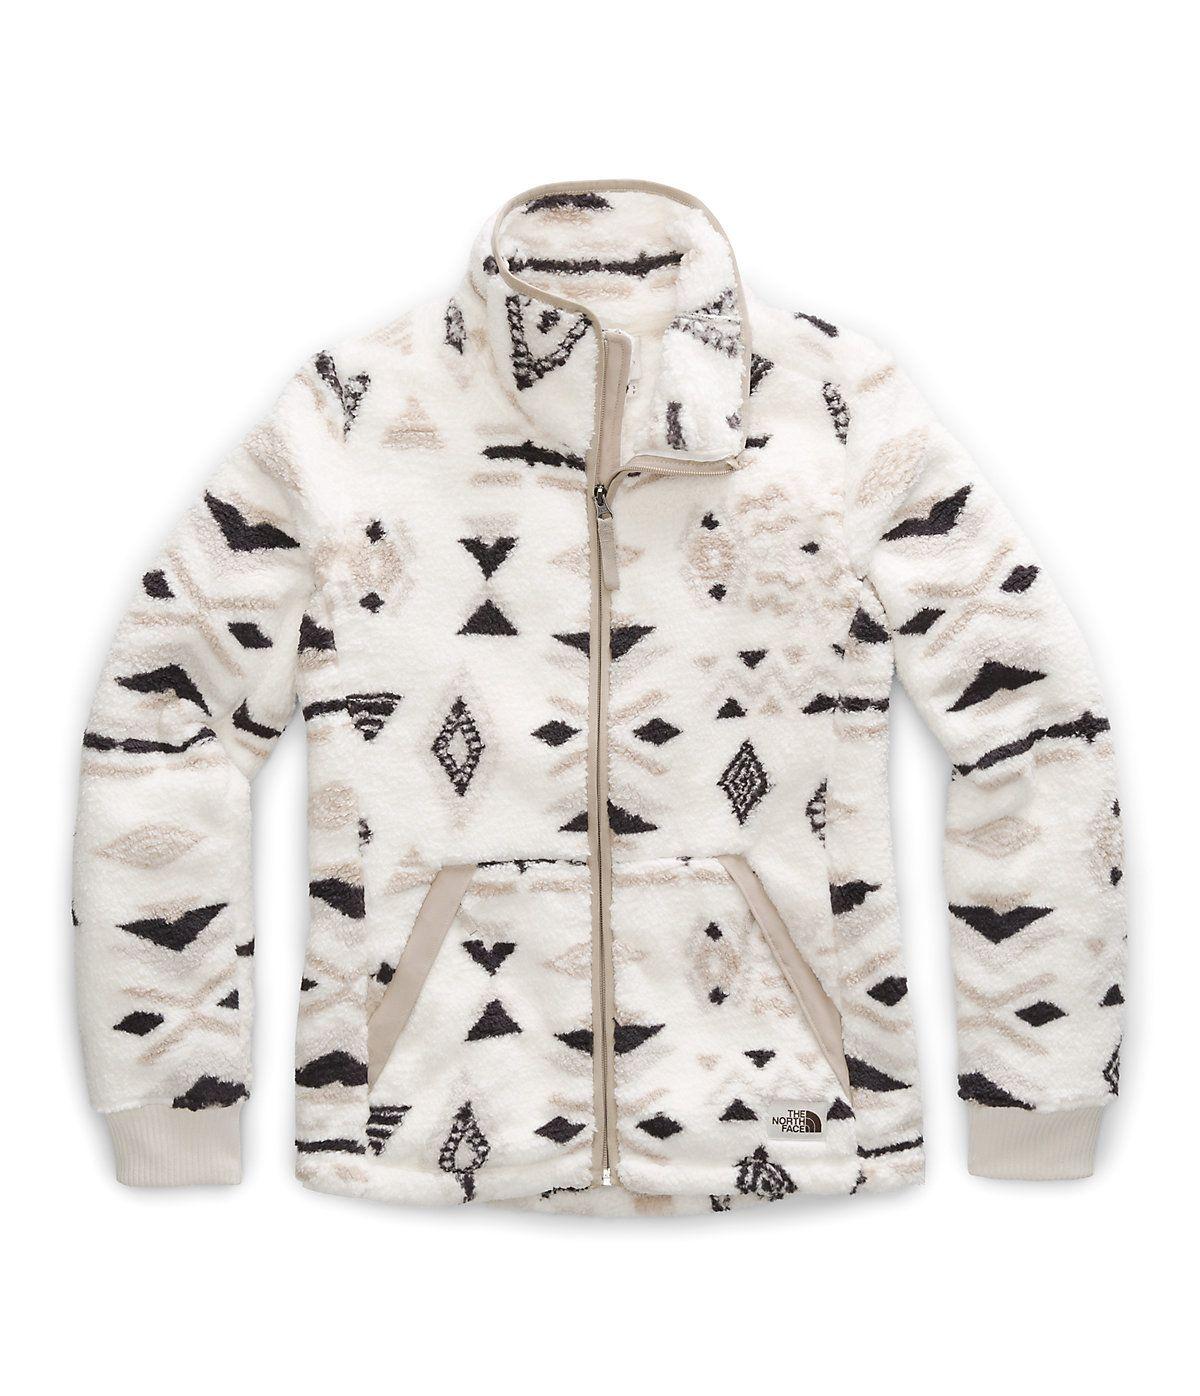 Women S Campshire Full Zip Jacket The North Face Jackets Zip Jackets Hoodies [ 1396 x 1200 Pixel ]